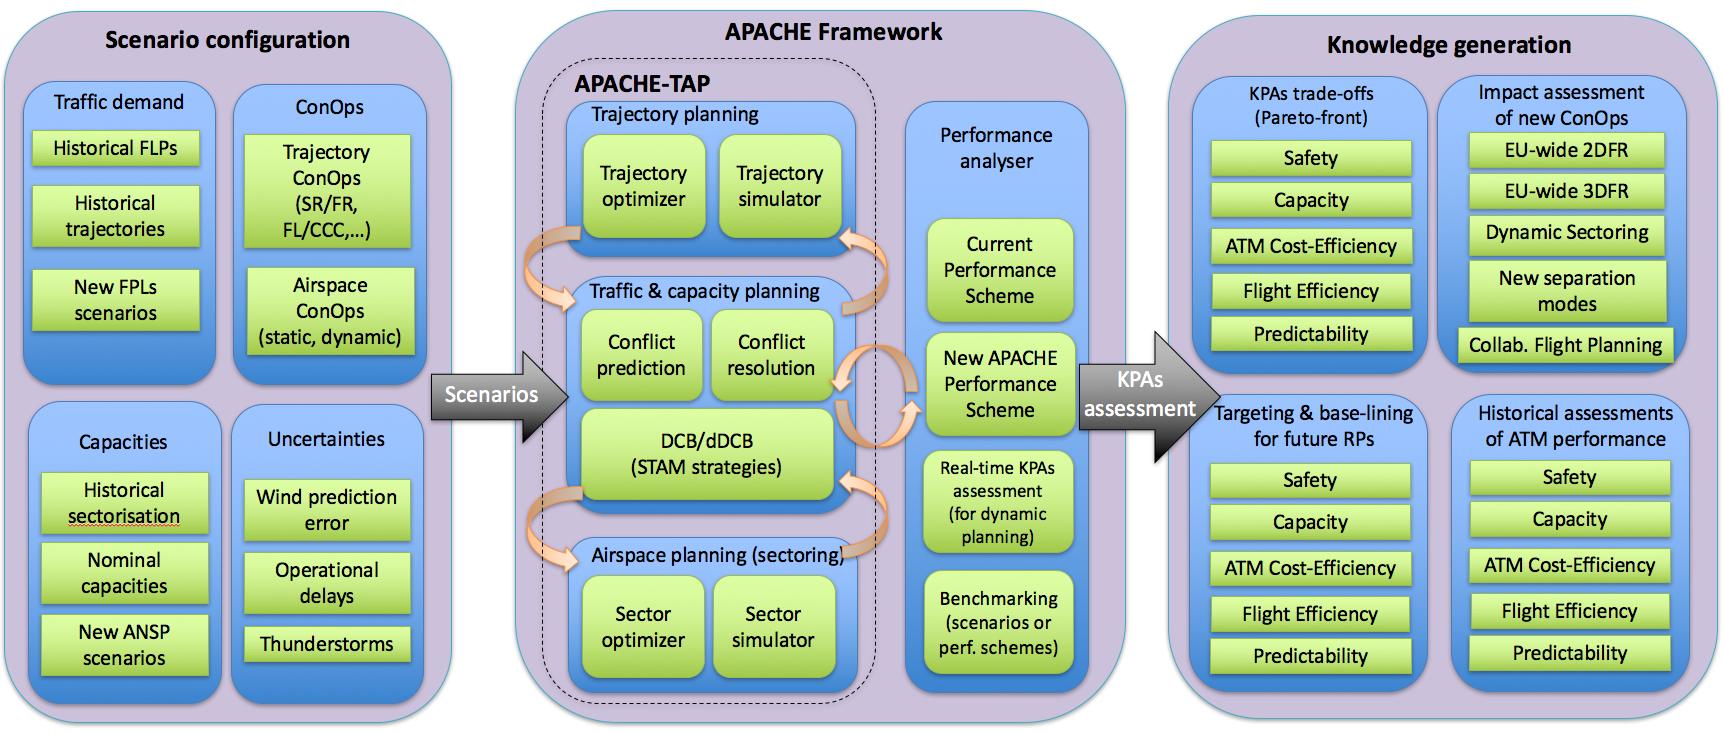 APACHE_framework